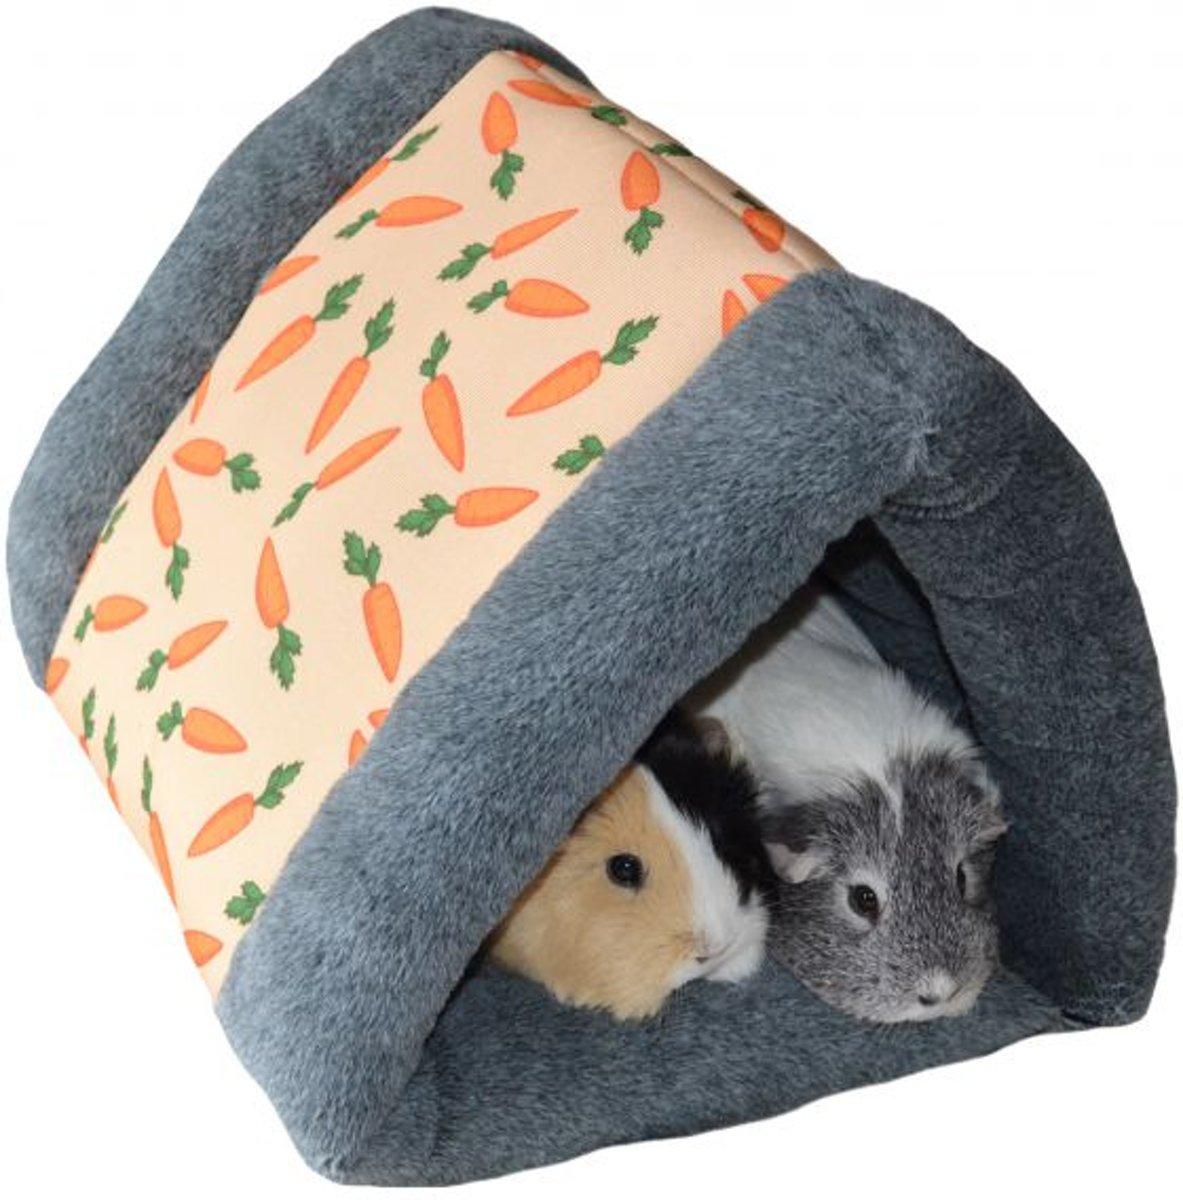 Knaagdier tunnel snuggle n sleep 37 x 31 x 25 cm